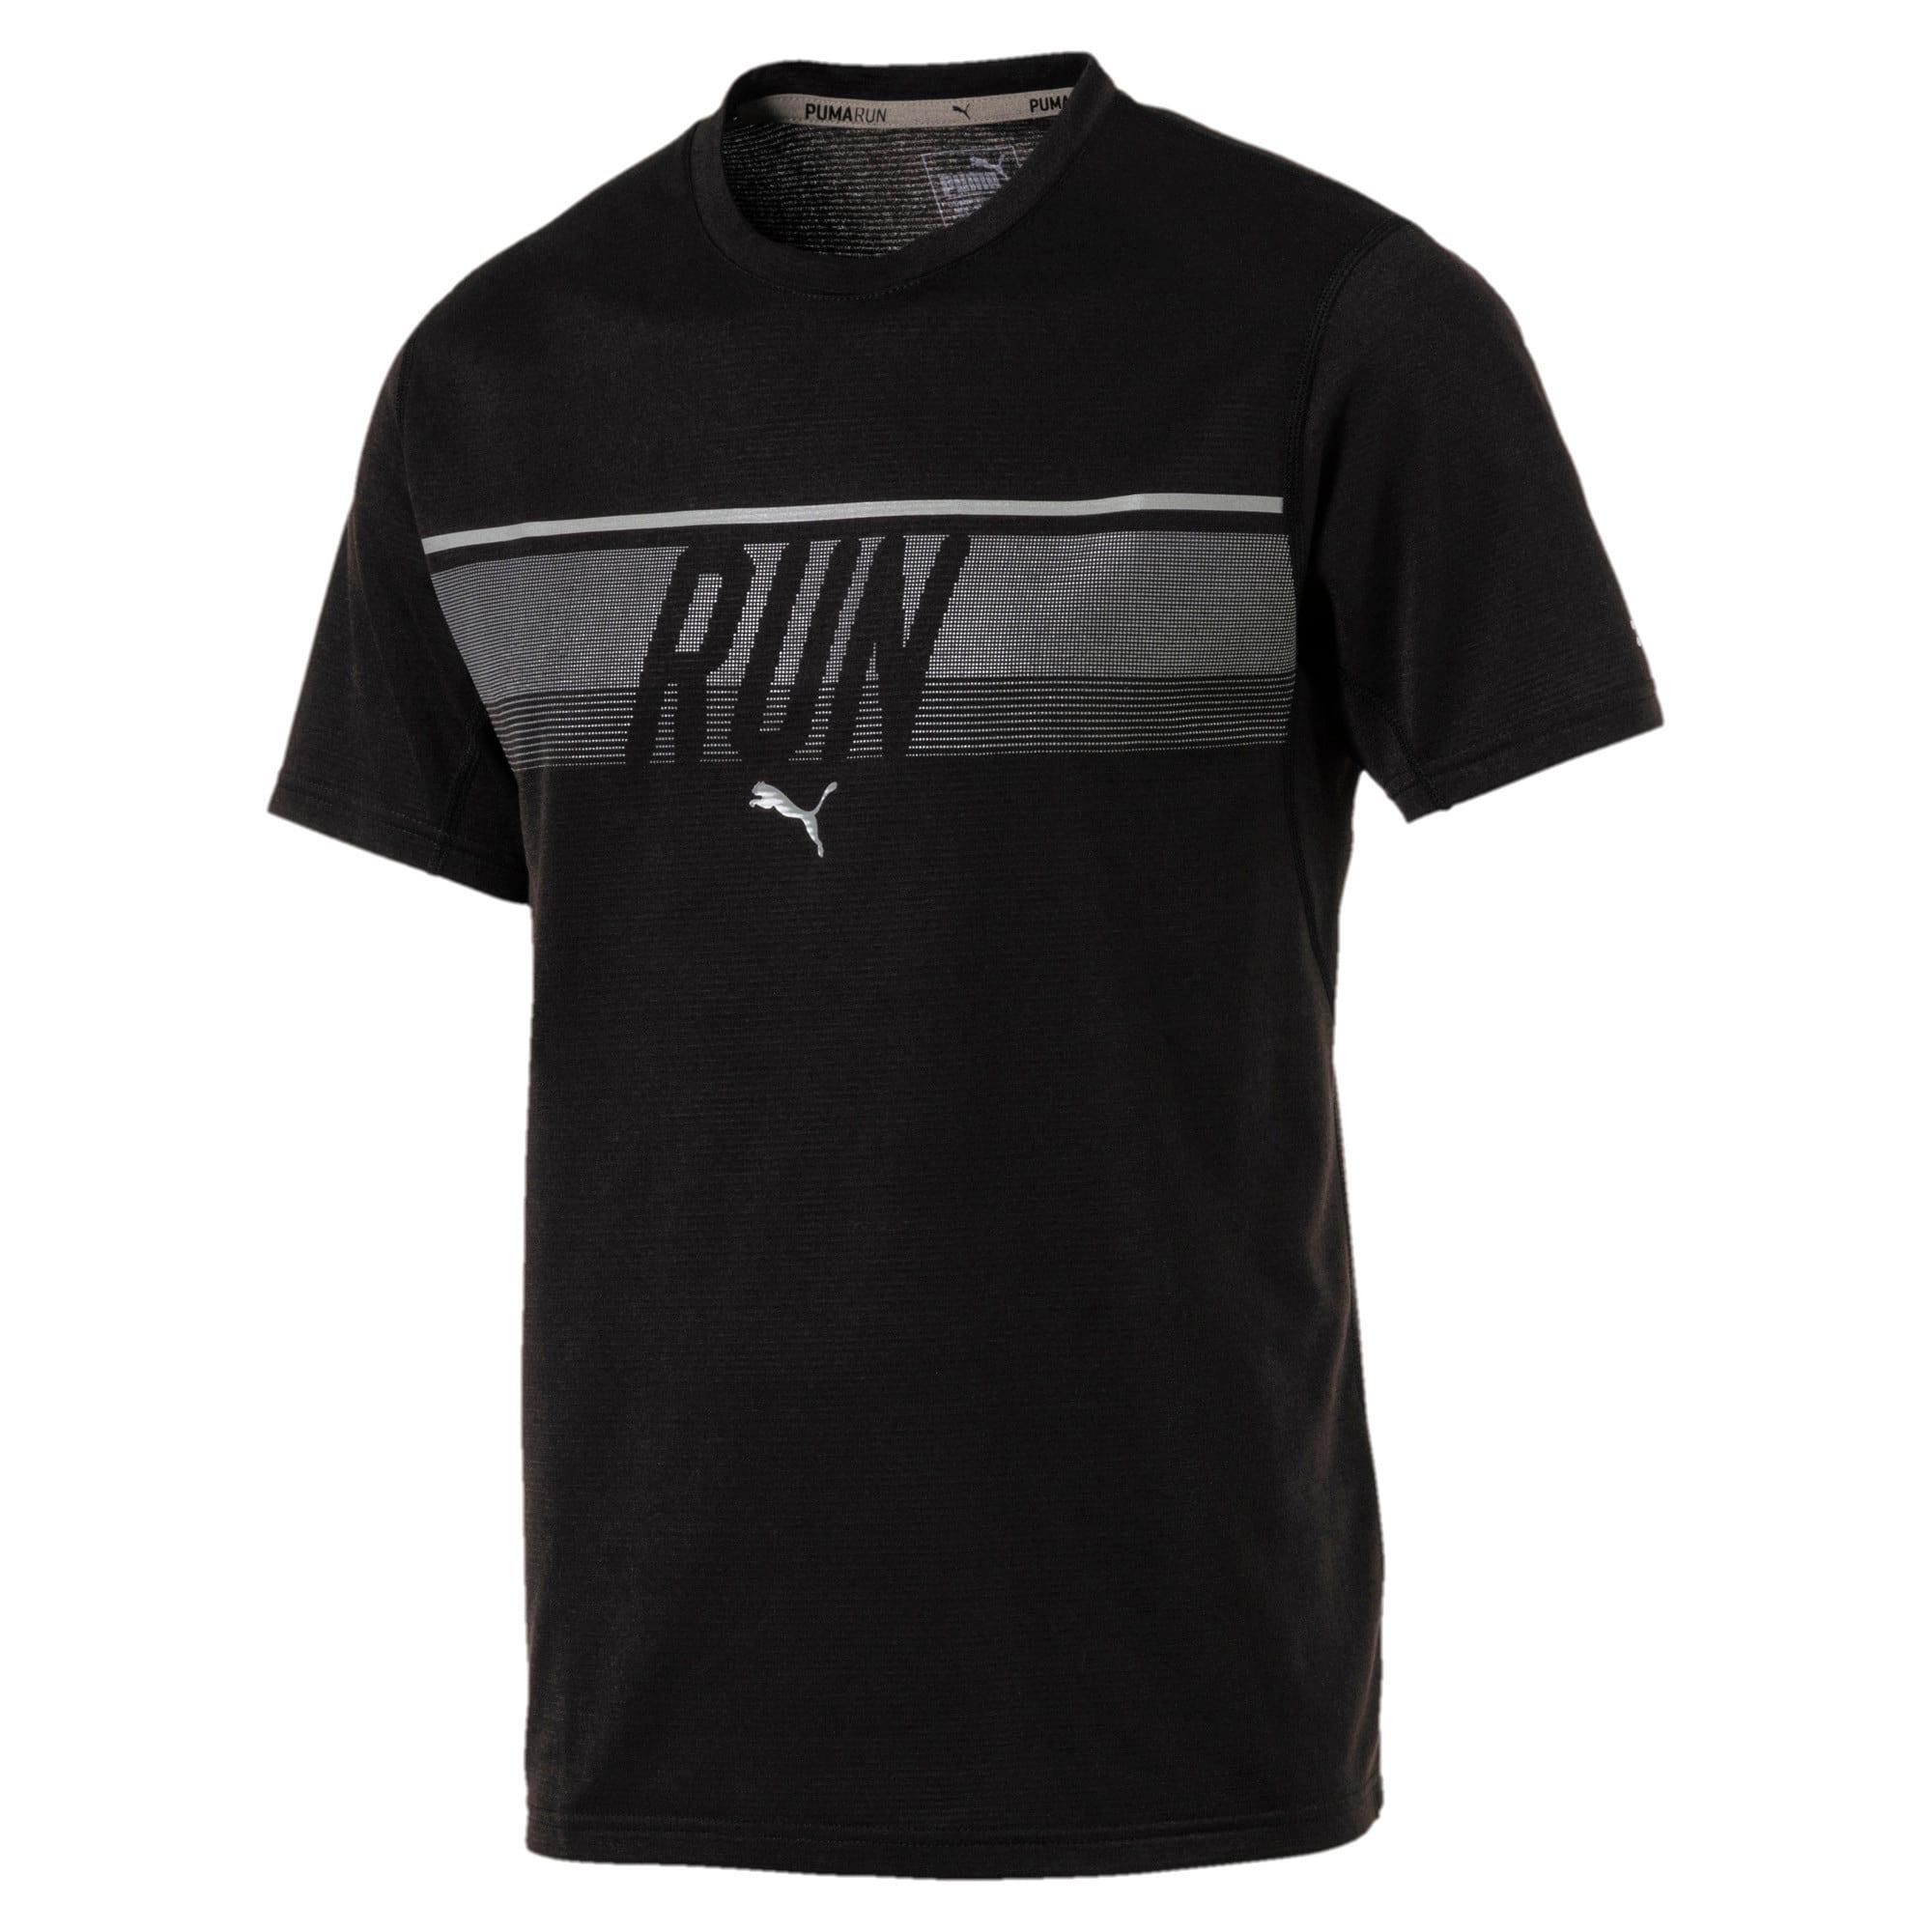 Thumbnail 4 of Run Men's Running T-Shirt, Puma Black, medium-IND